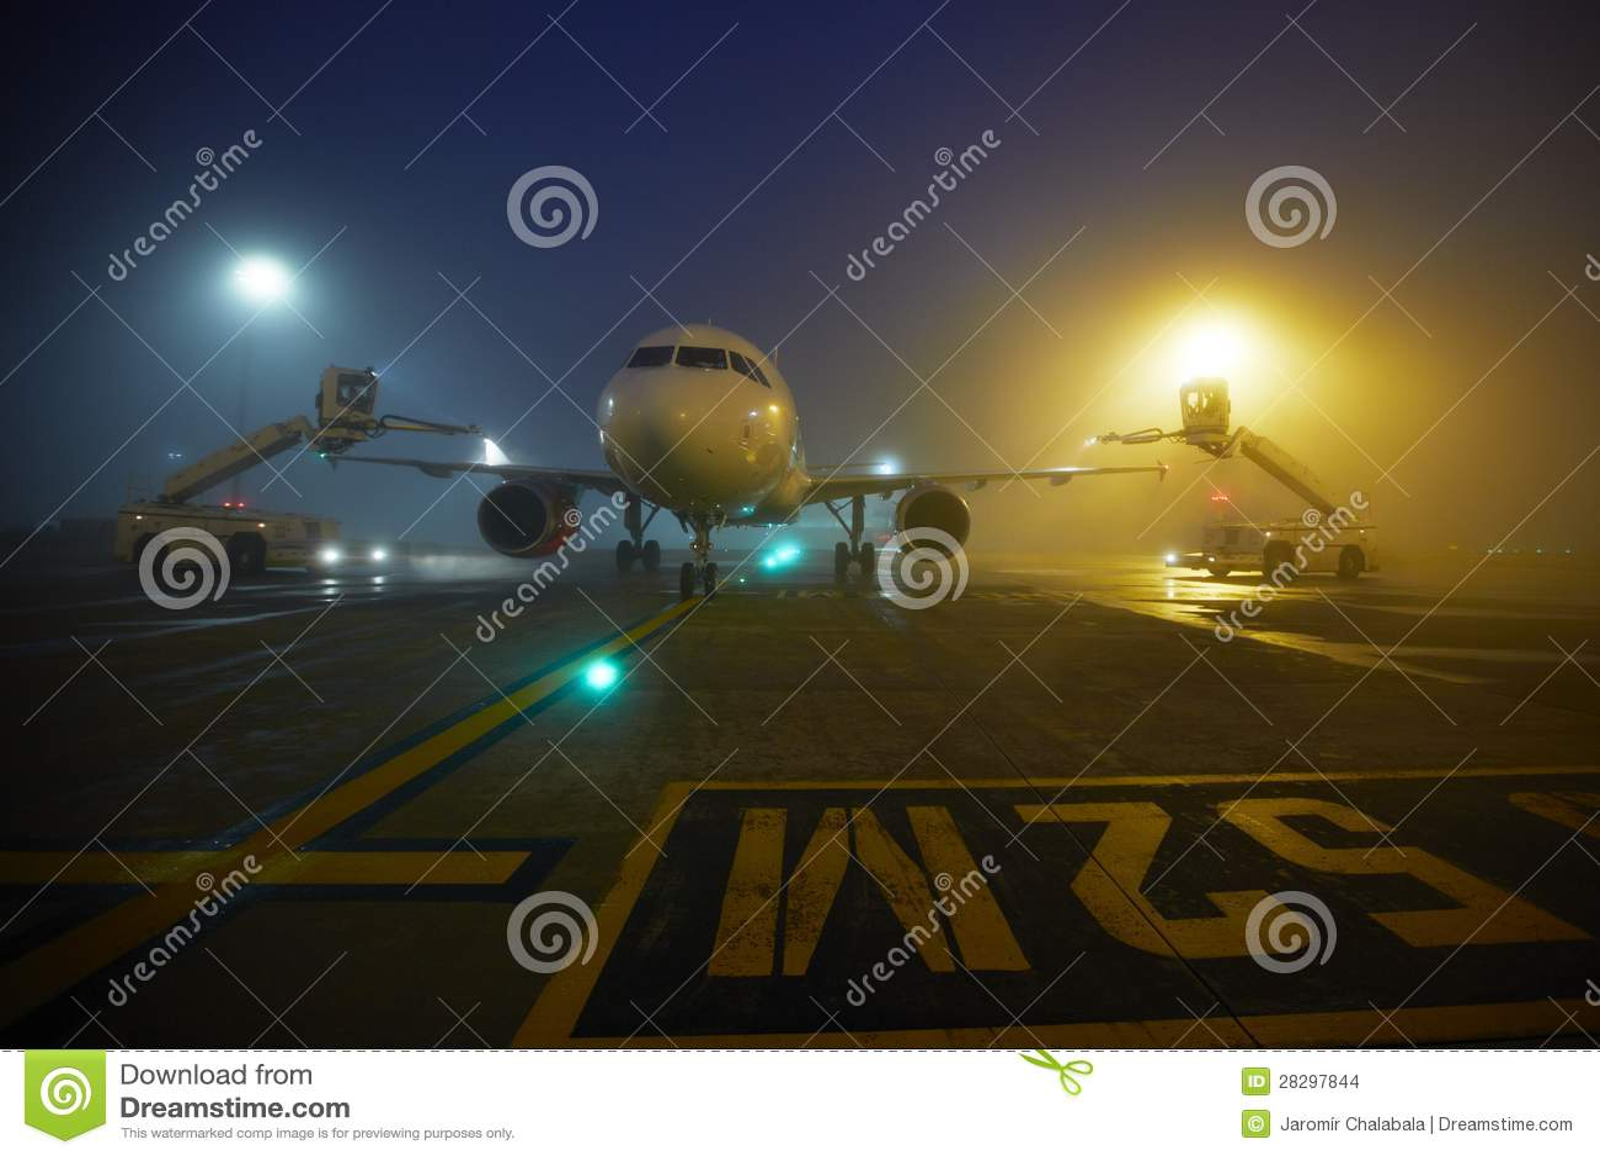 Luchthaven bij de nacht